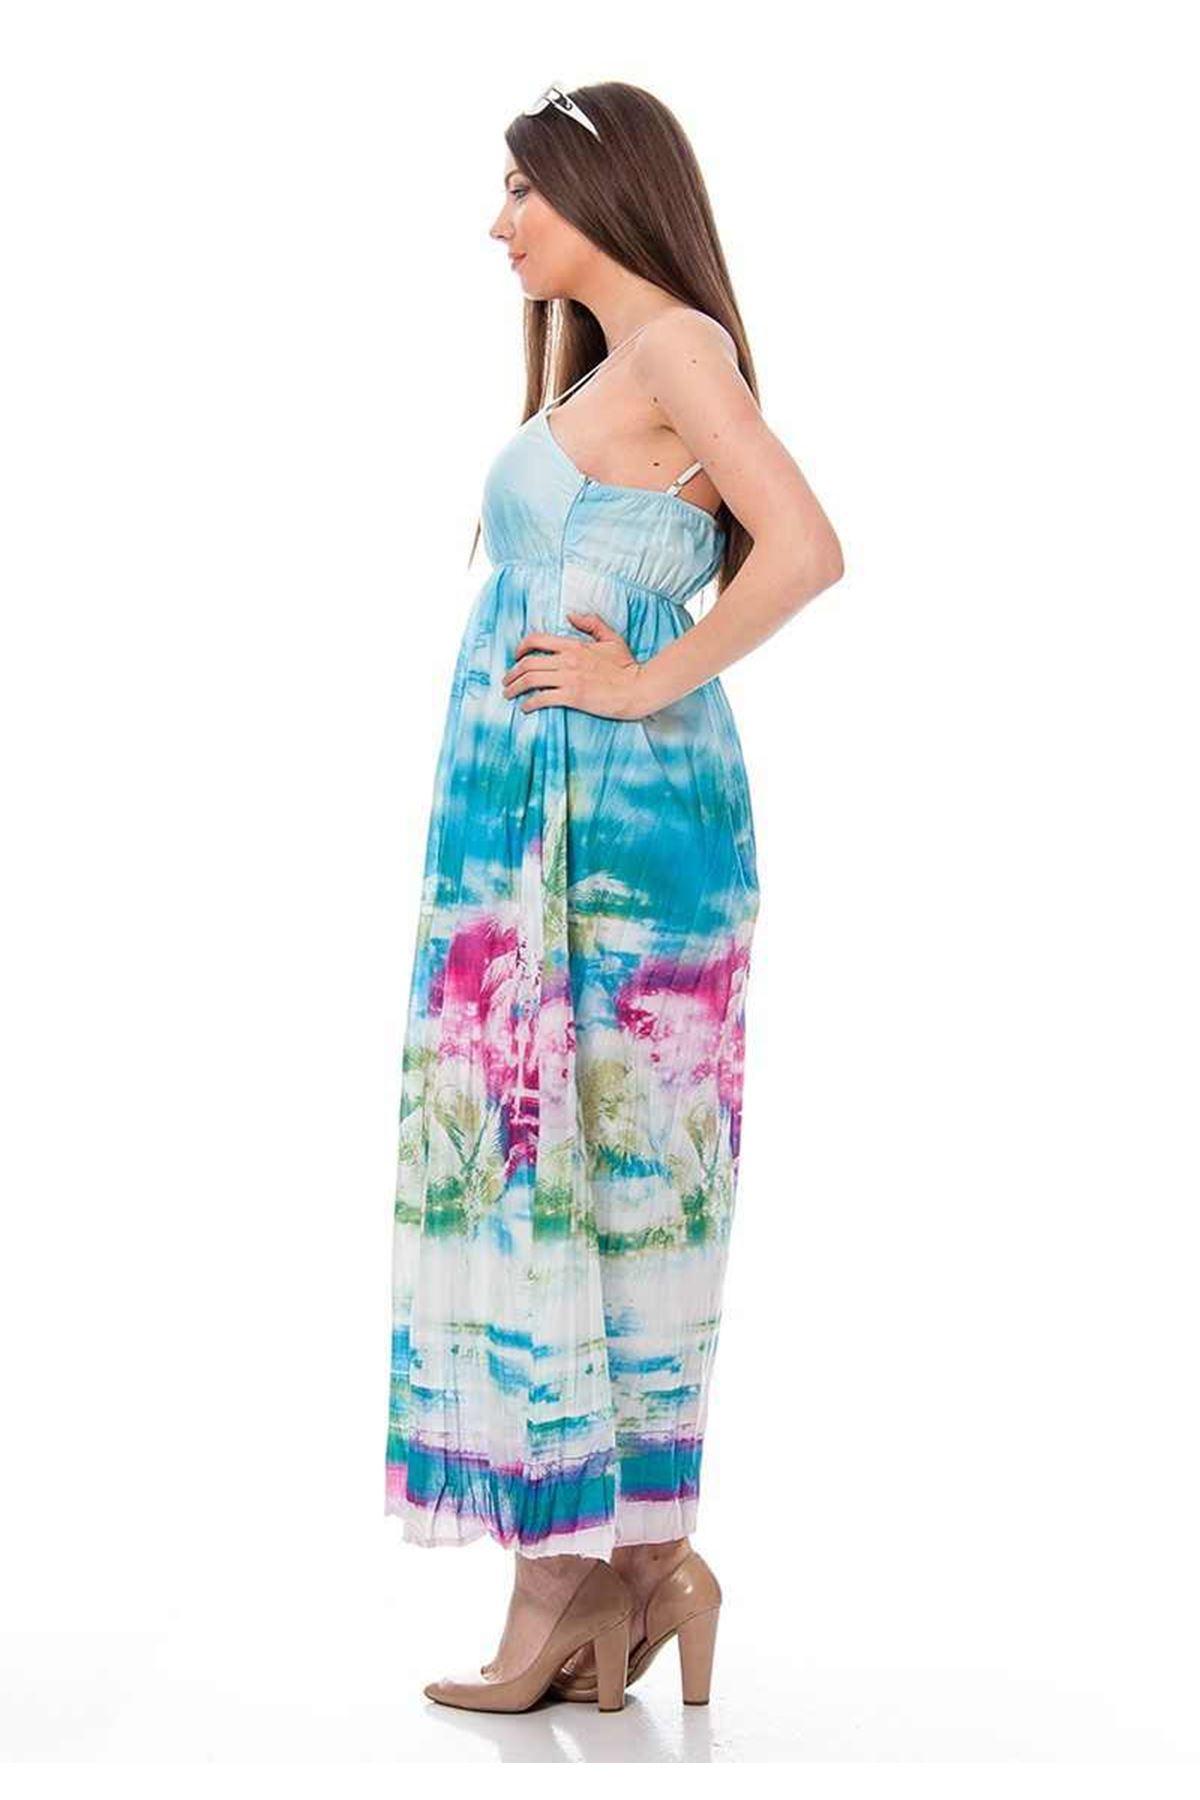 Buz Mavi Desenli Elbise H1-115784